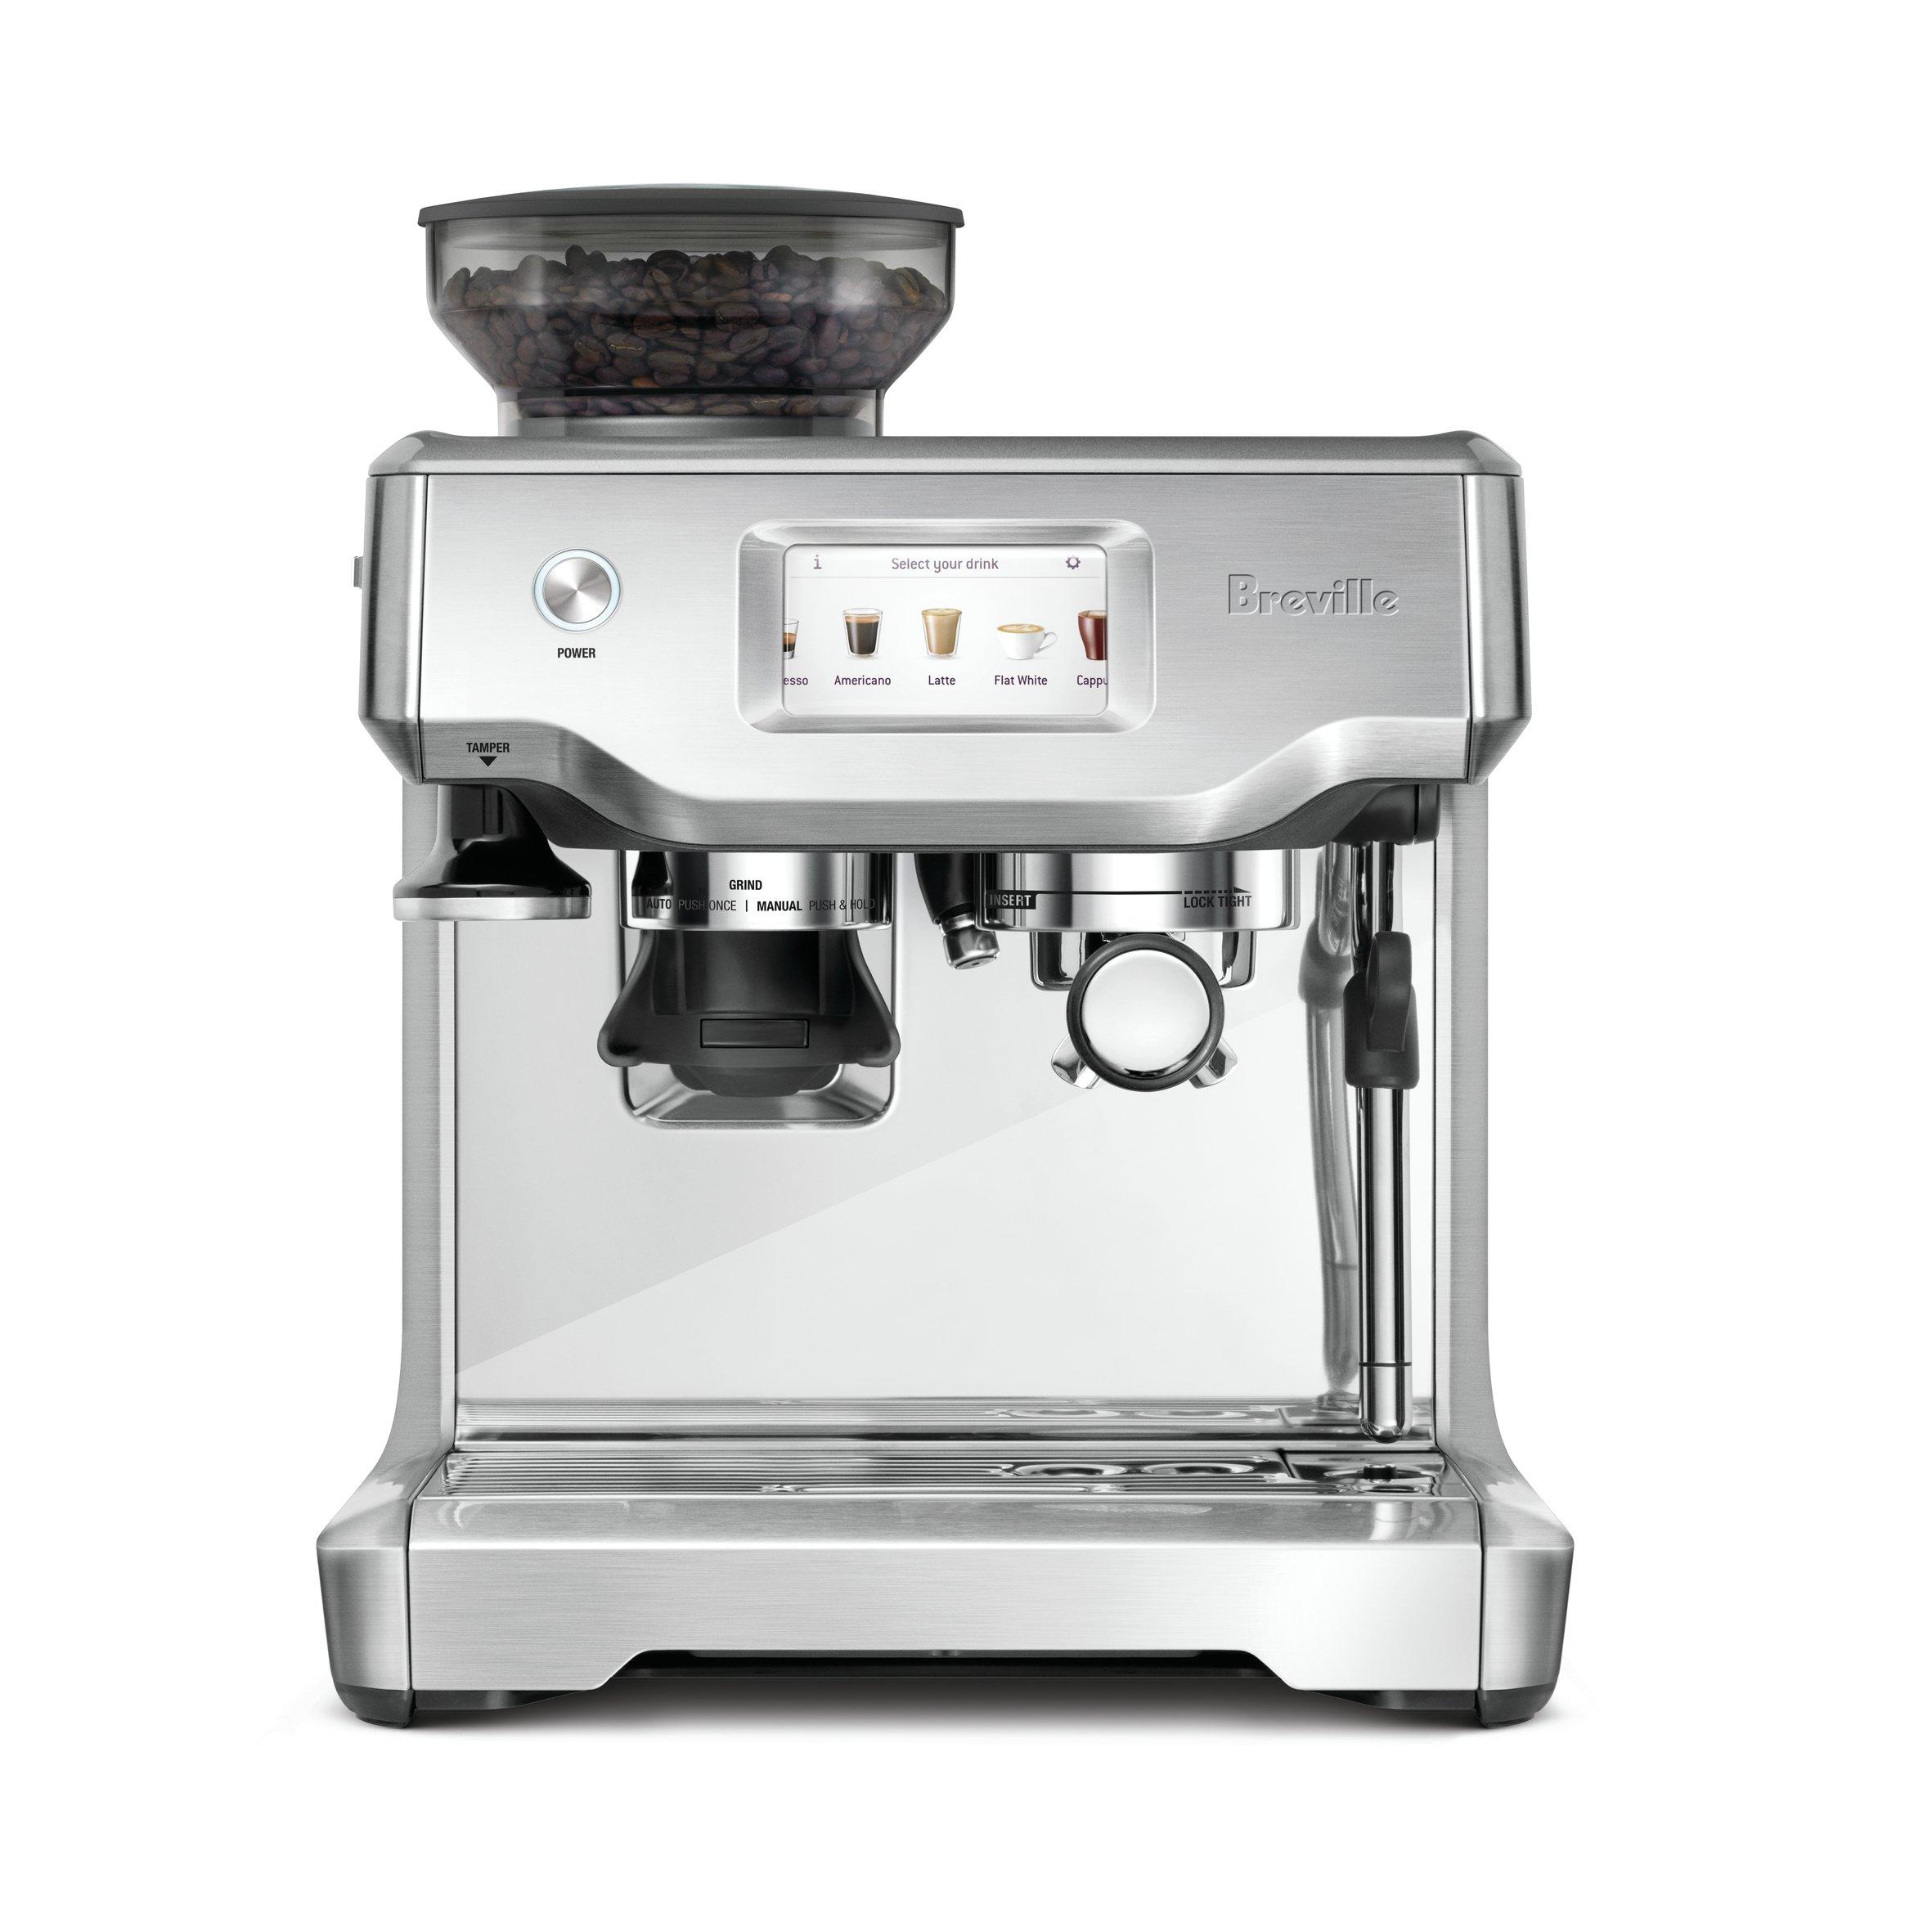 Breville BES880BSS Barista Espresso Stainless